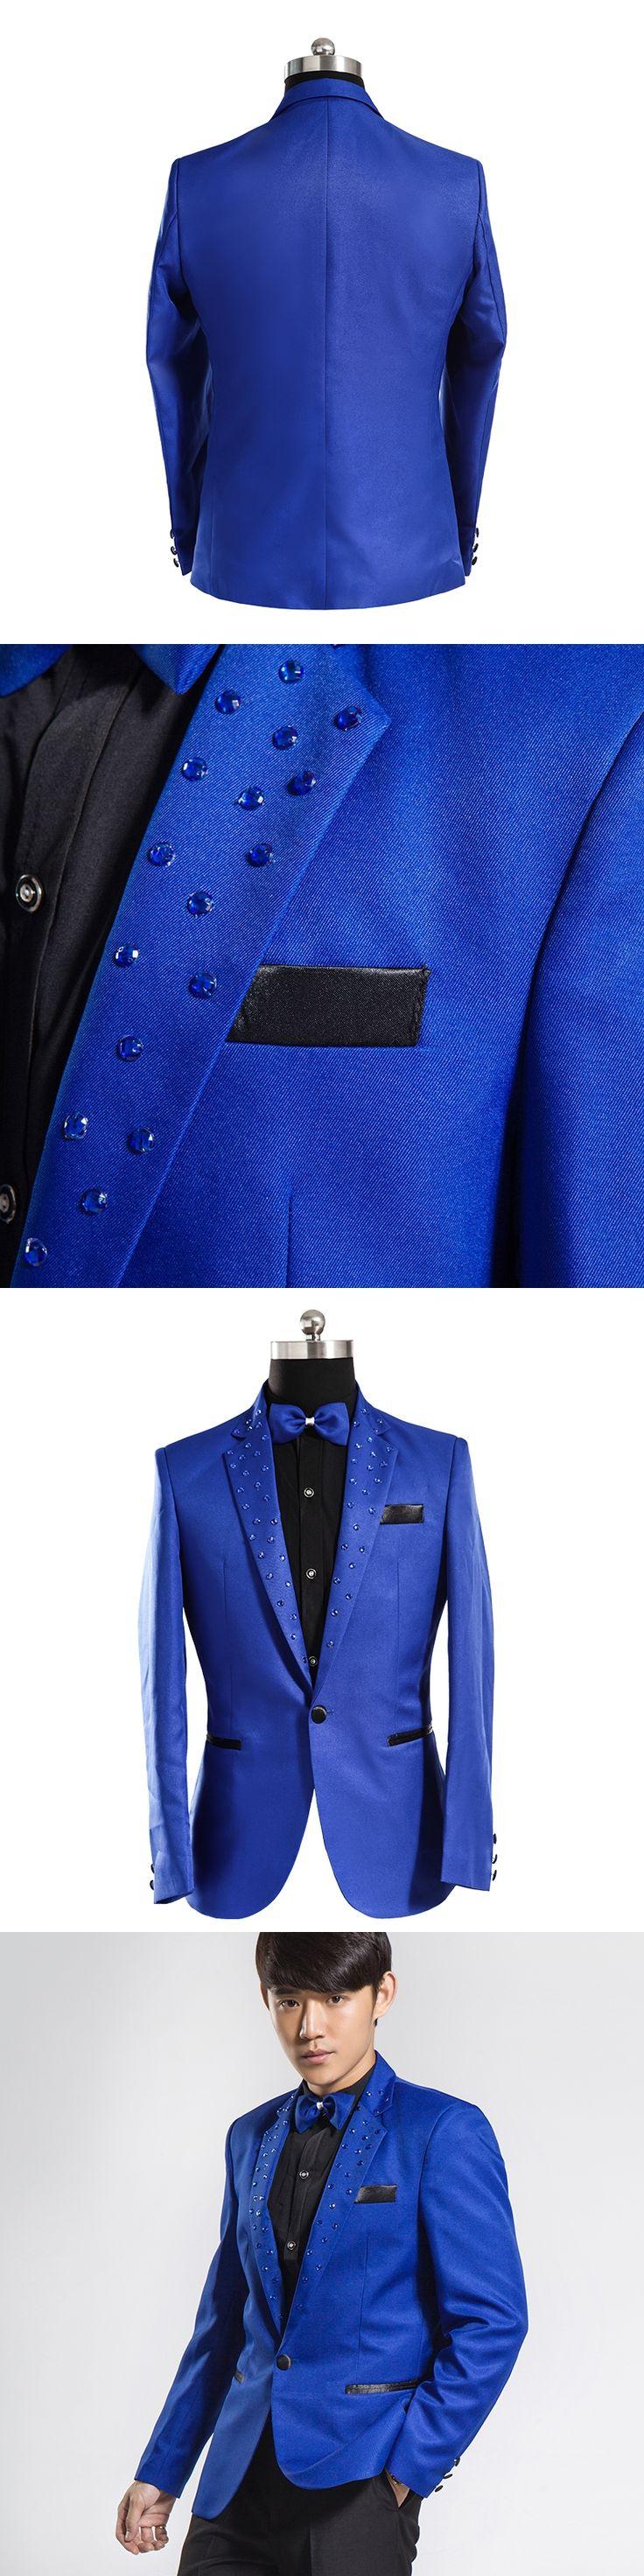 Mens blazers new arrivals 2017 royal blue blazer men's blazer masculino blue blazer jaqueta masculina